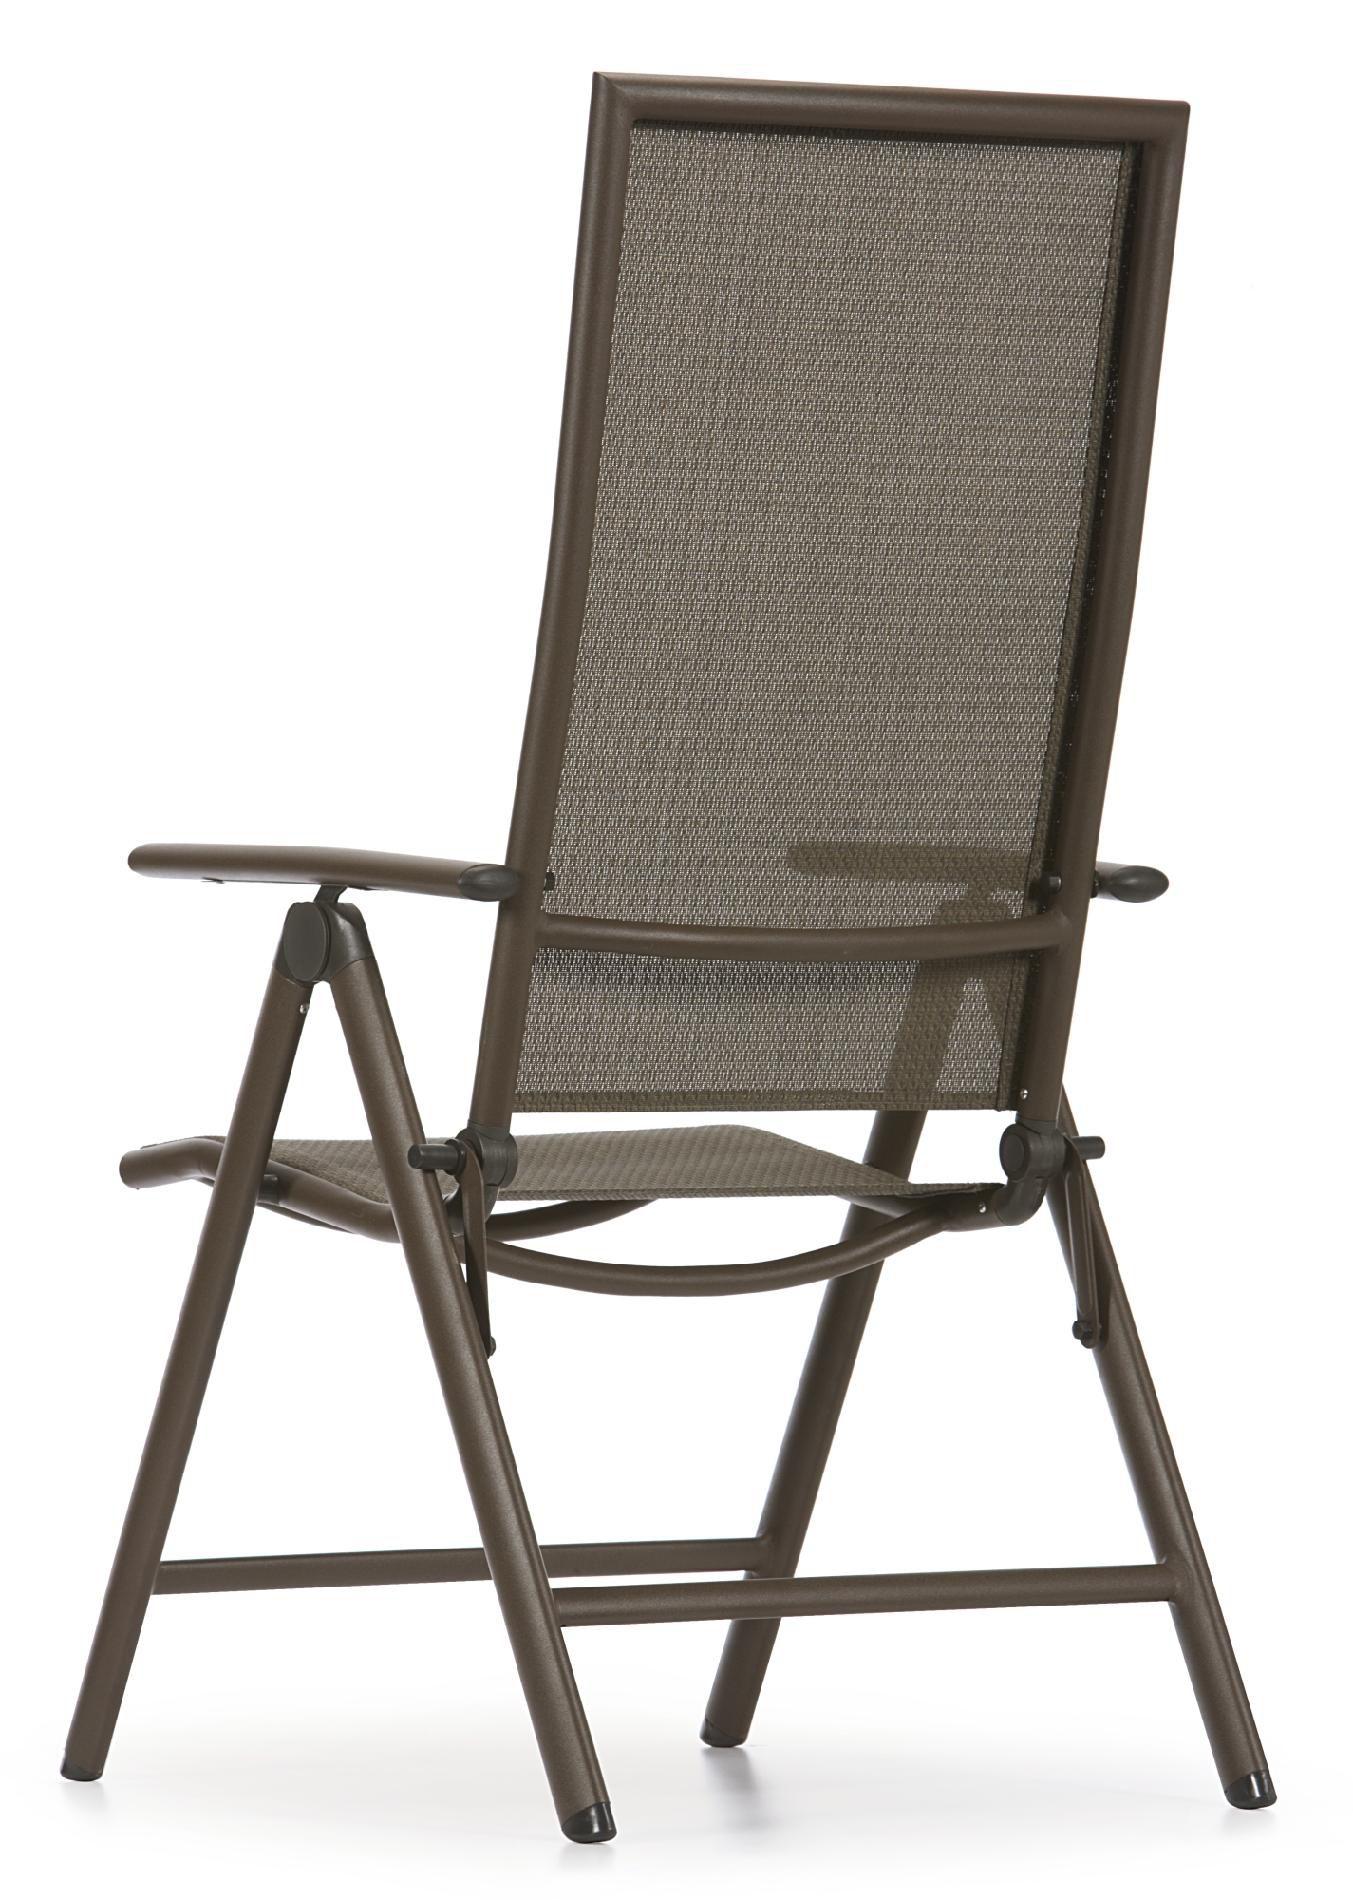 high folding chair modern leather desk la z boy outdoor alex back sling limited availability 3